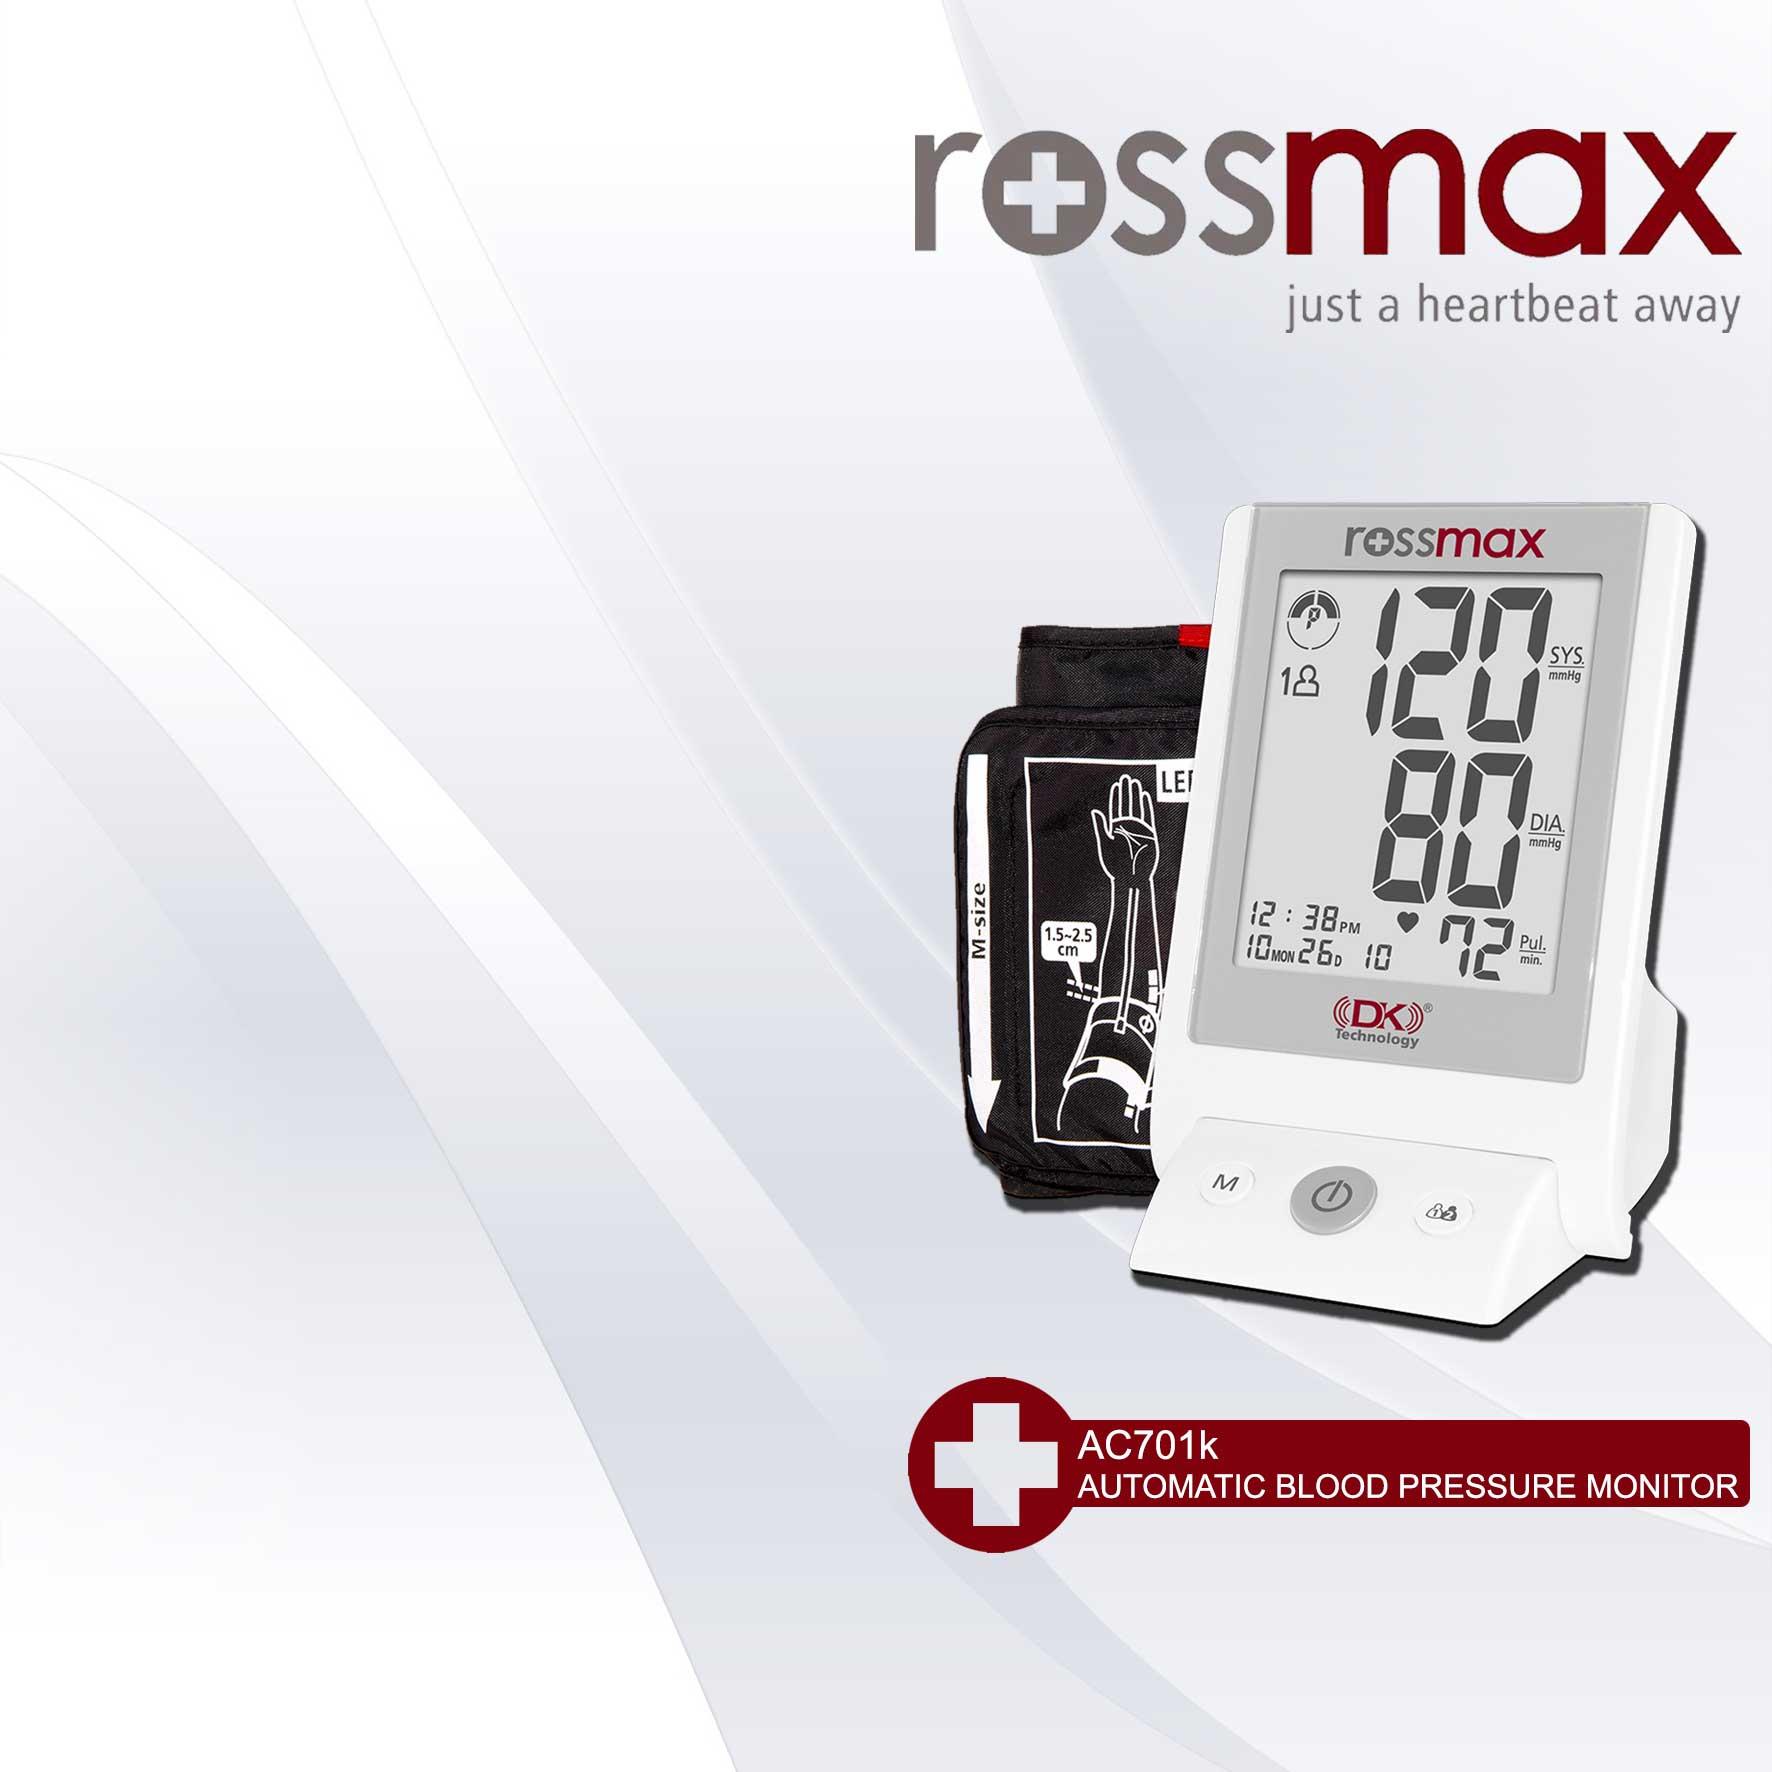 Rossmax Bloeddrukmeters